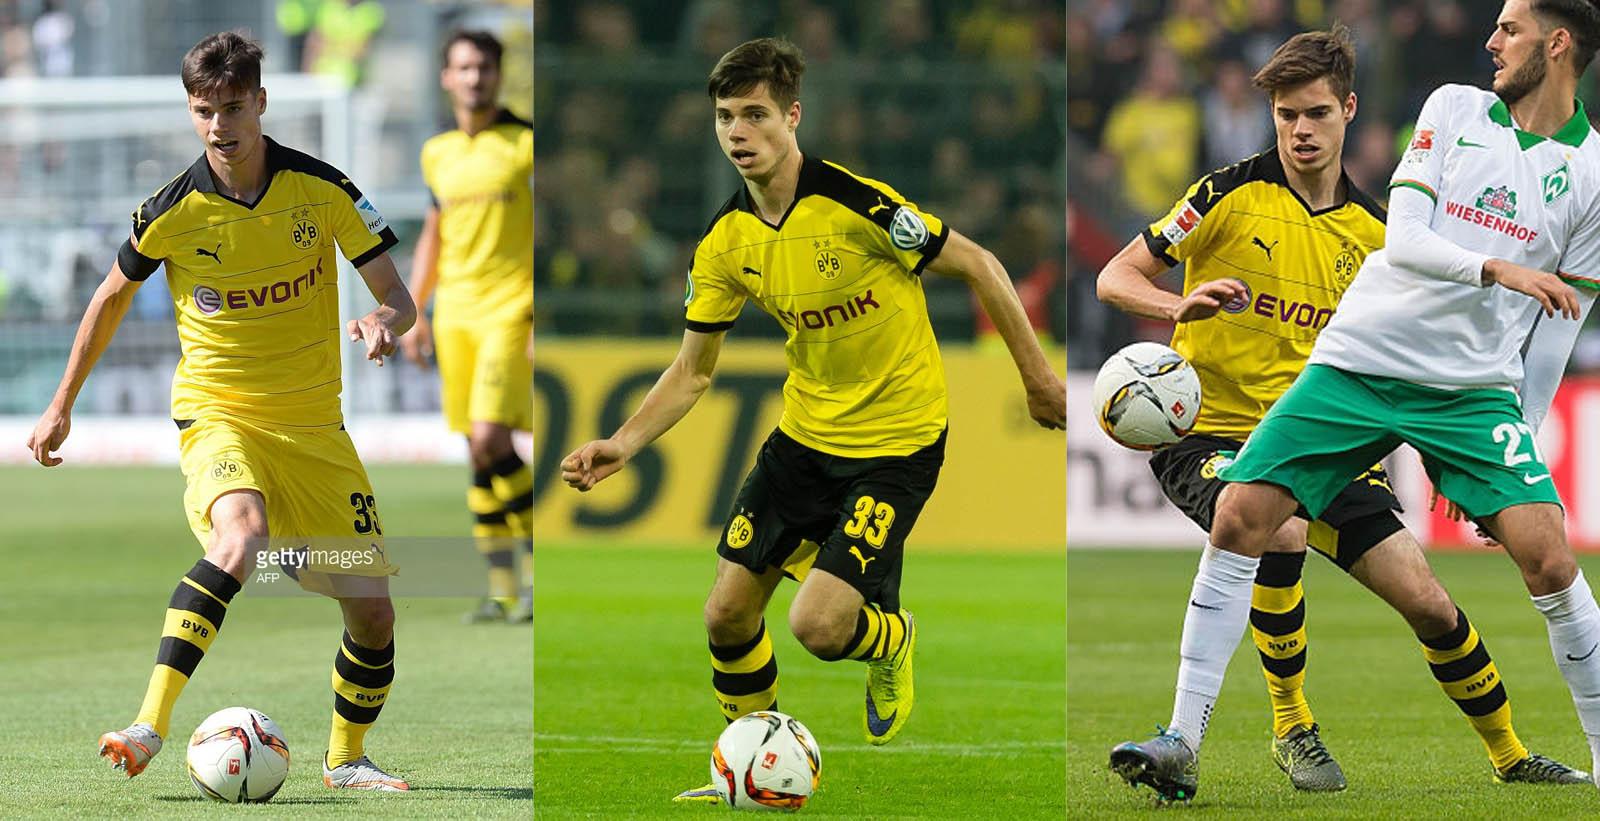 Borussia Dortmund s Julian Weigl Switches to Nike Magista Boots